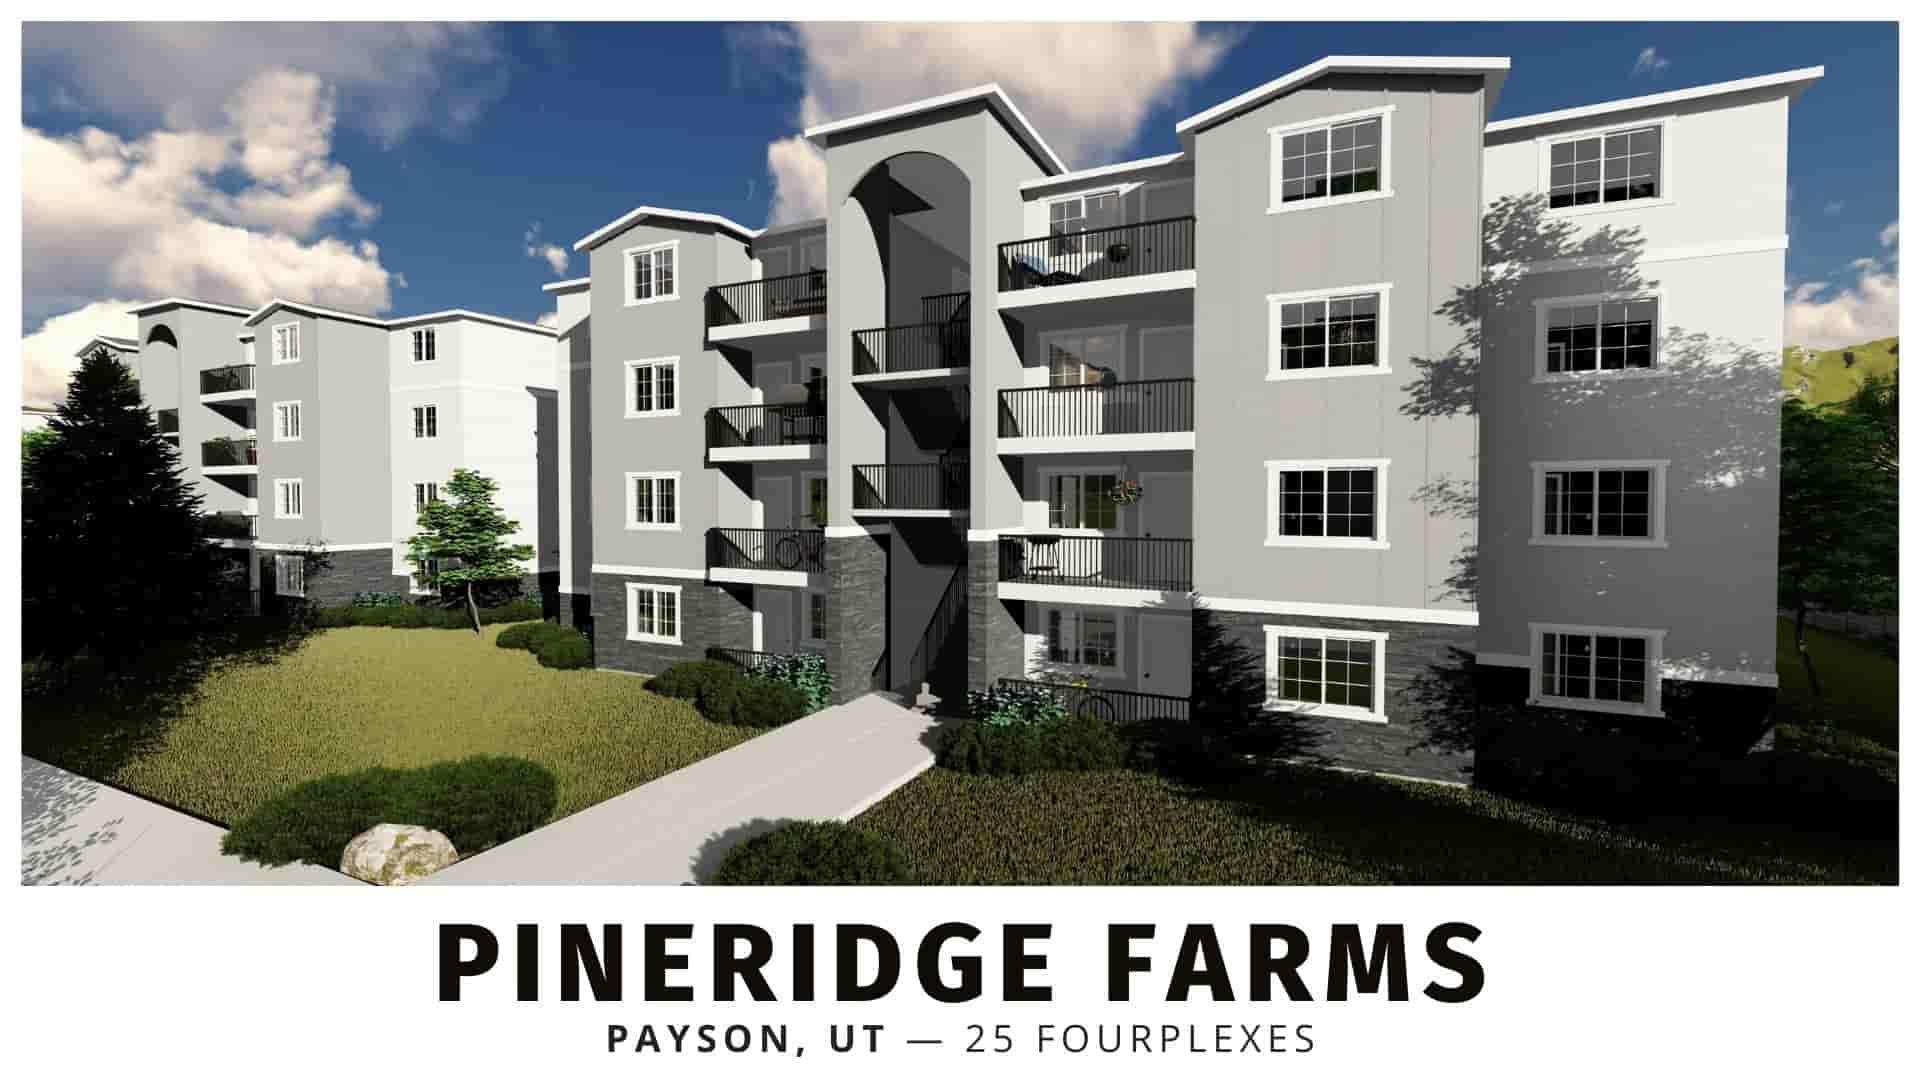 Pineridge Farms Fourplexes for Sale in Payson, Utah